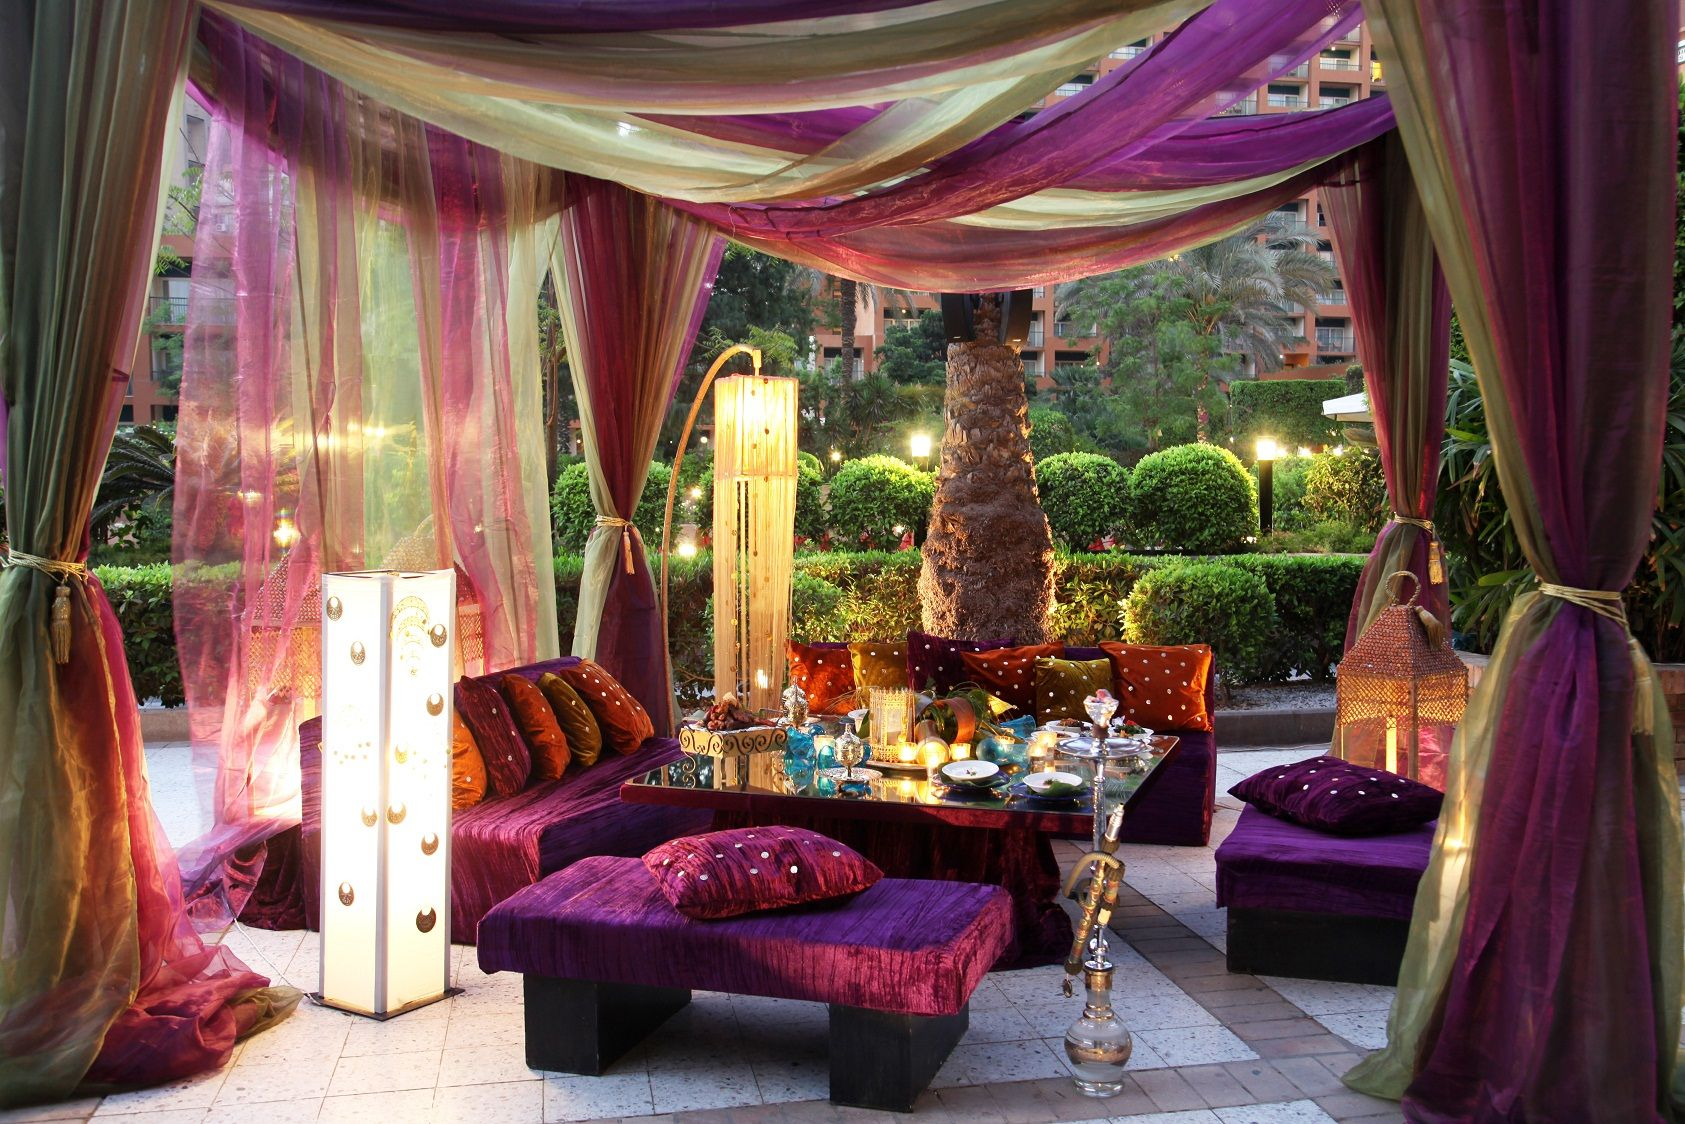 eid decoration ideas - Google Search | Middle eastern ...